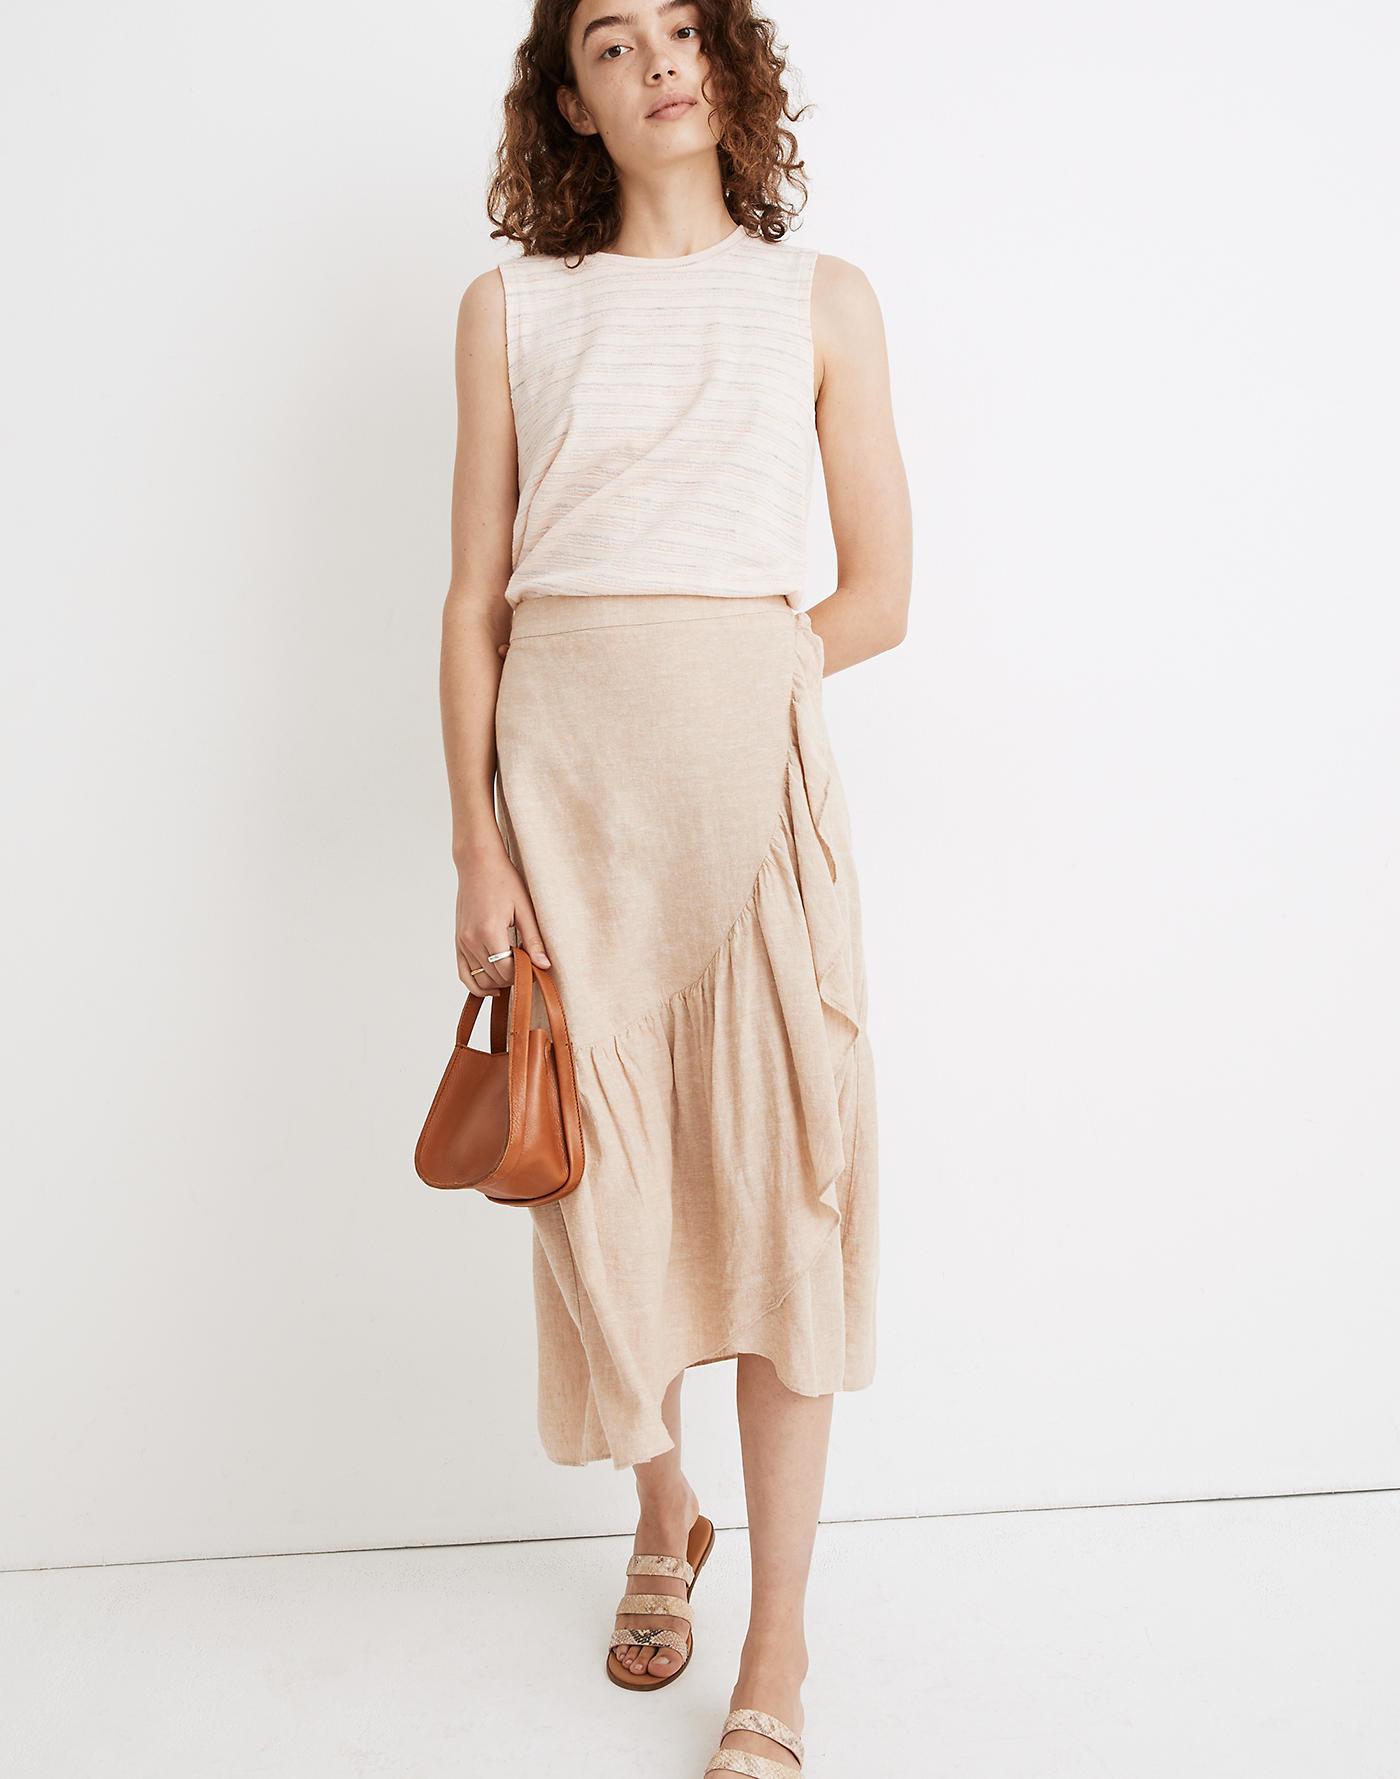 model wear sand colored wrap skirt